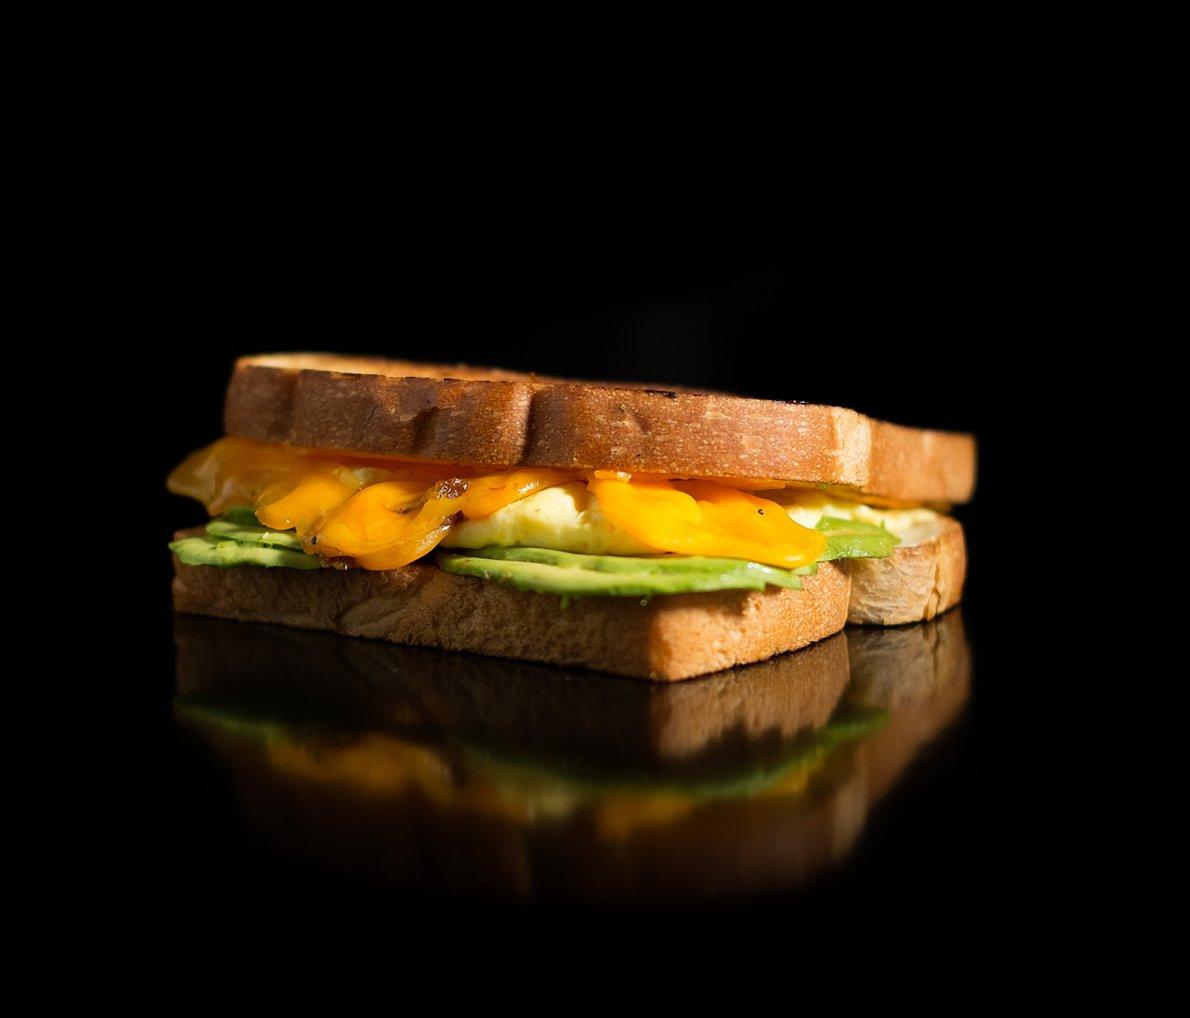 The Avocado Egg 'n' Cheese